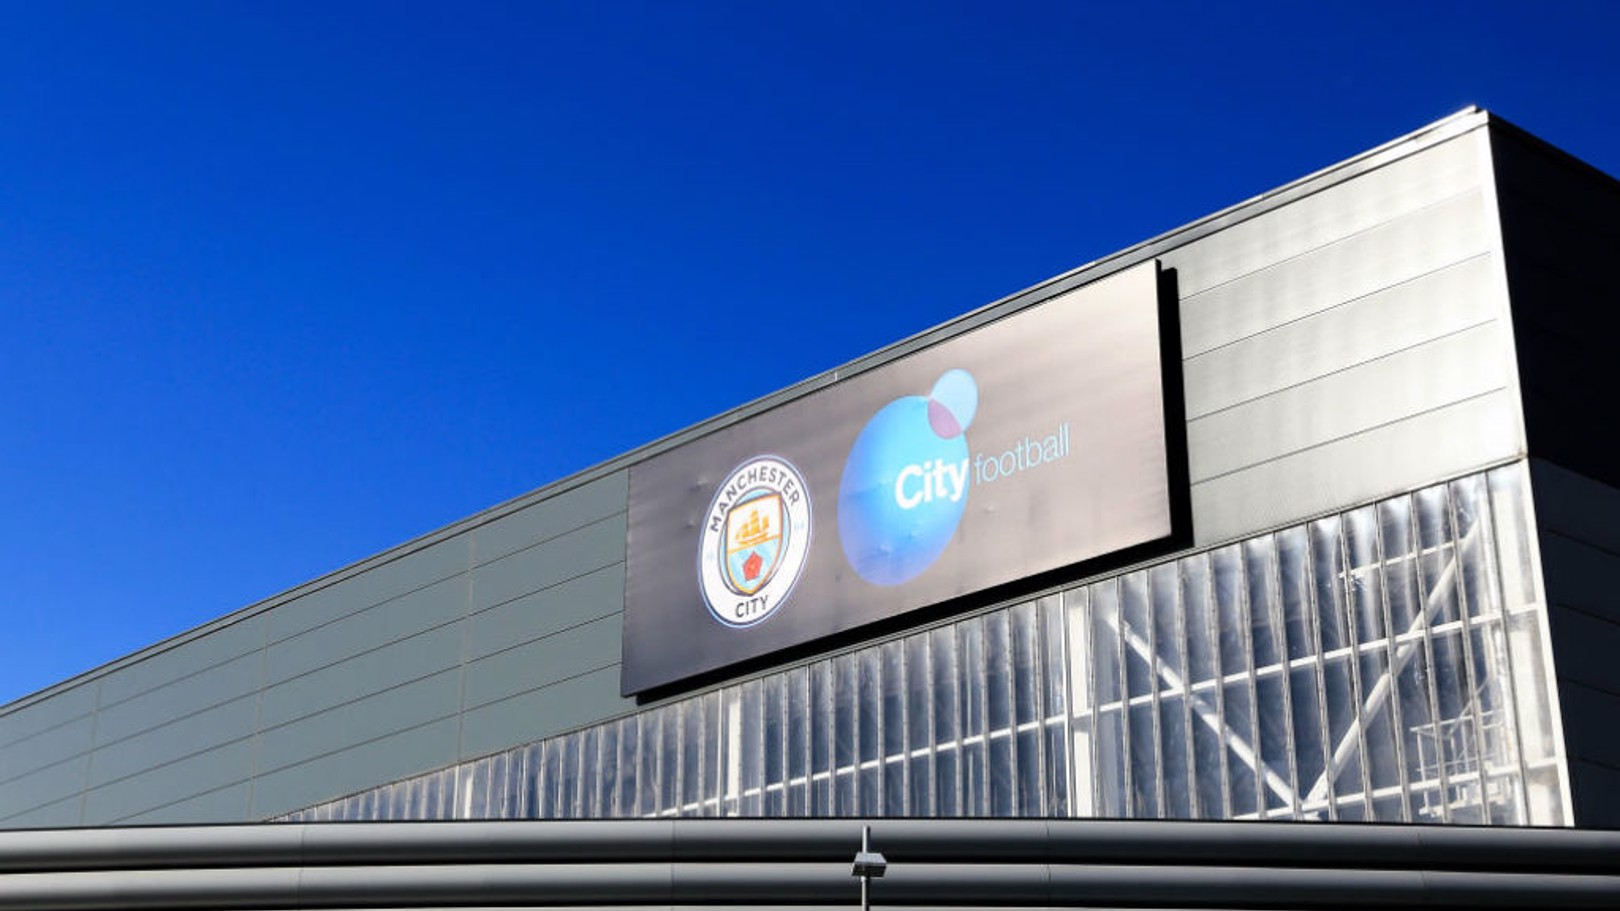 The Manchester City Football Academy